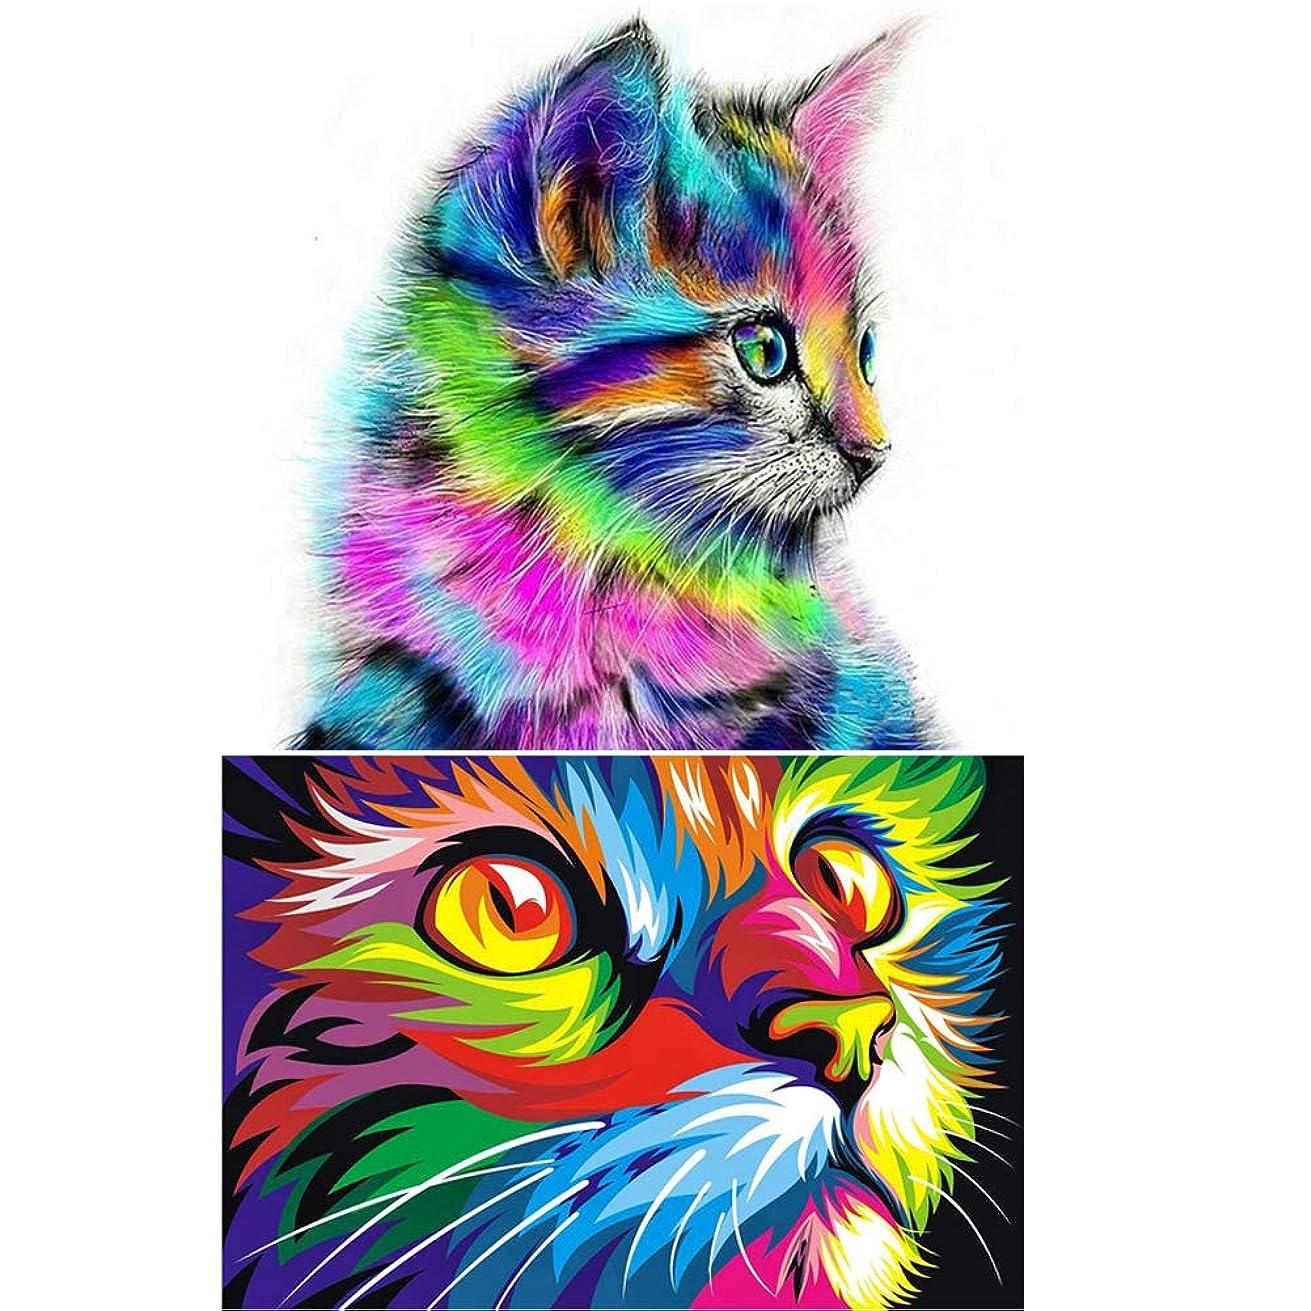 2Pack 5D Diamond Painting Kits Full Drill Diamond Embroidery (Cat)